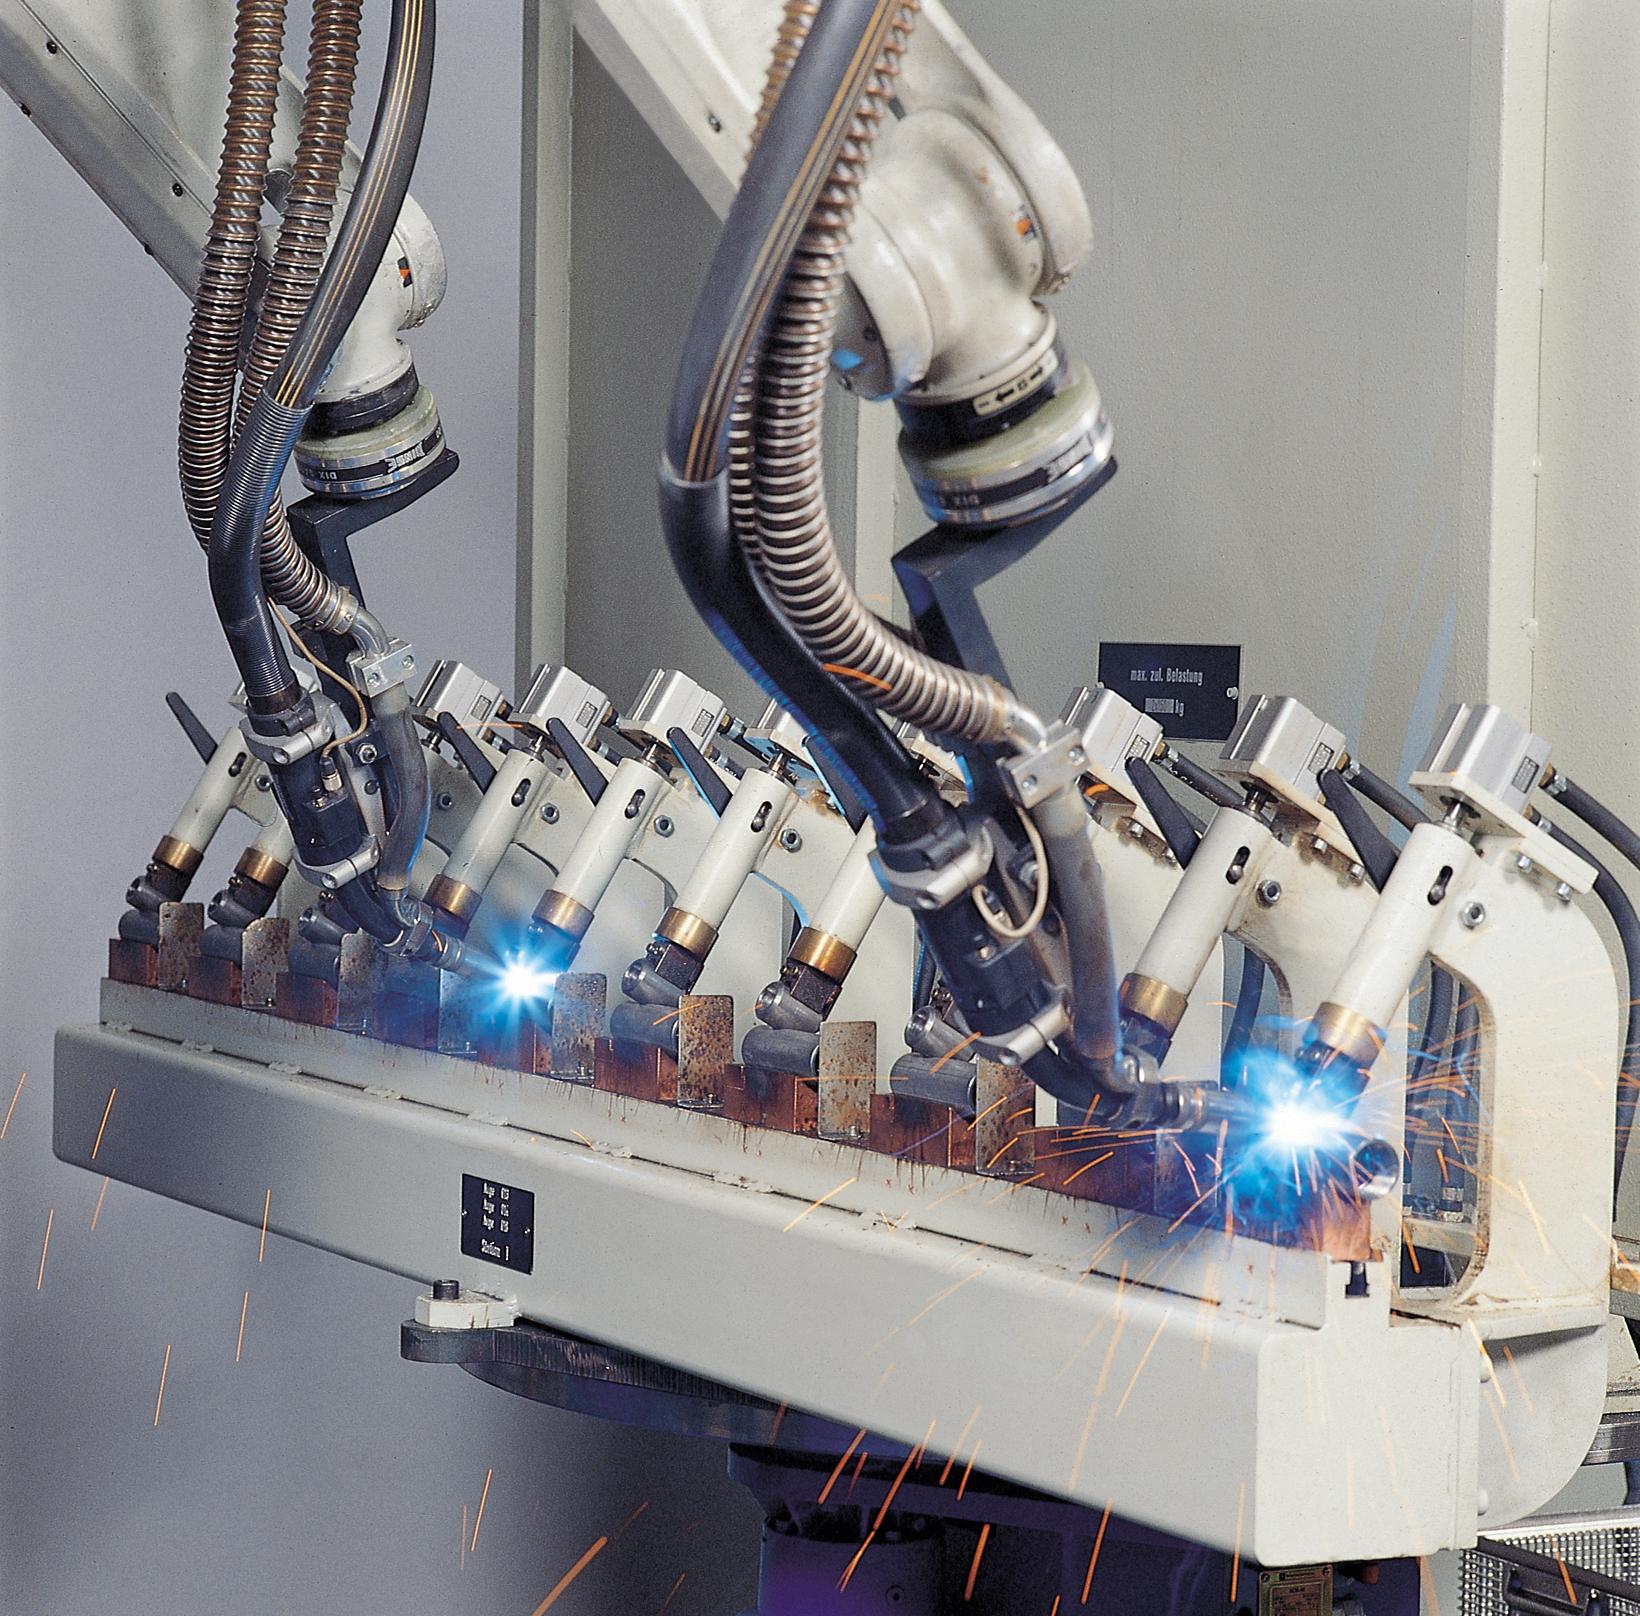 Charmant 110 Verkabelung Ideen - Schaltplan Serie Circuit Collection ...